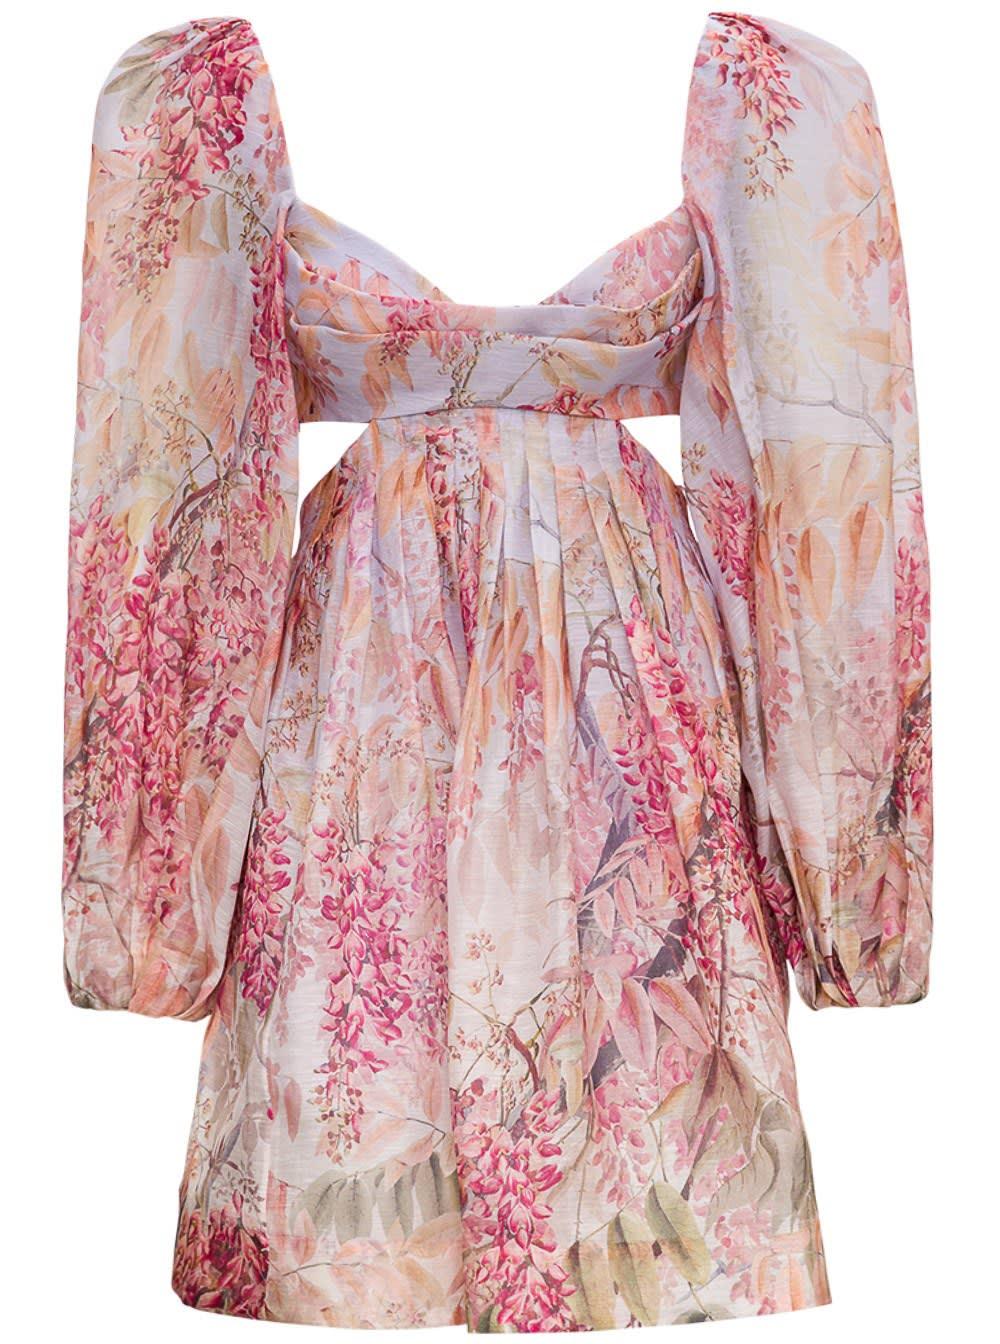 Buy Zimmermann Botanica Bralette Dress In Linen Blend online, shop Zimmermann with free shipping